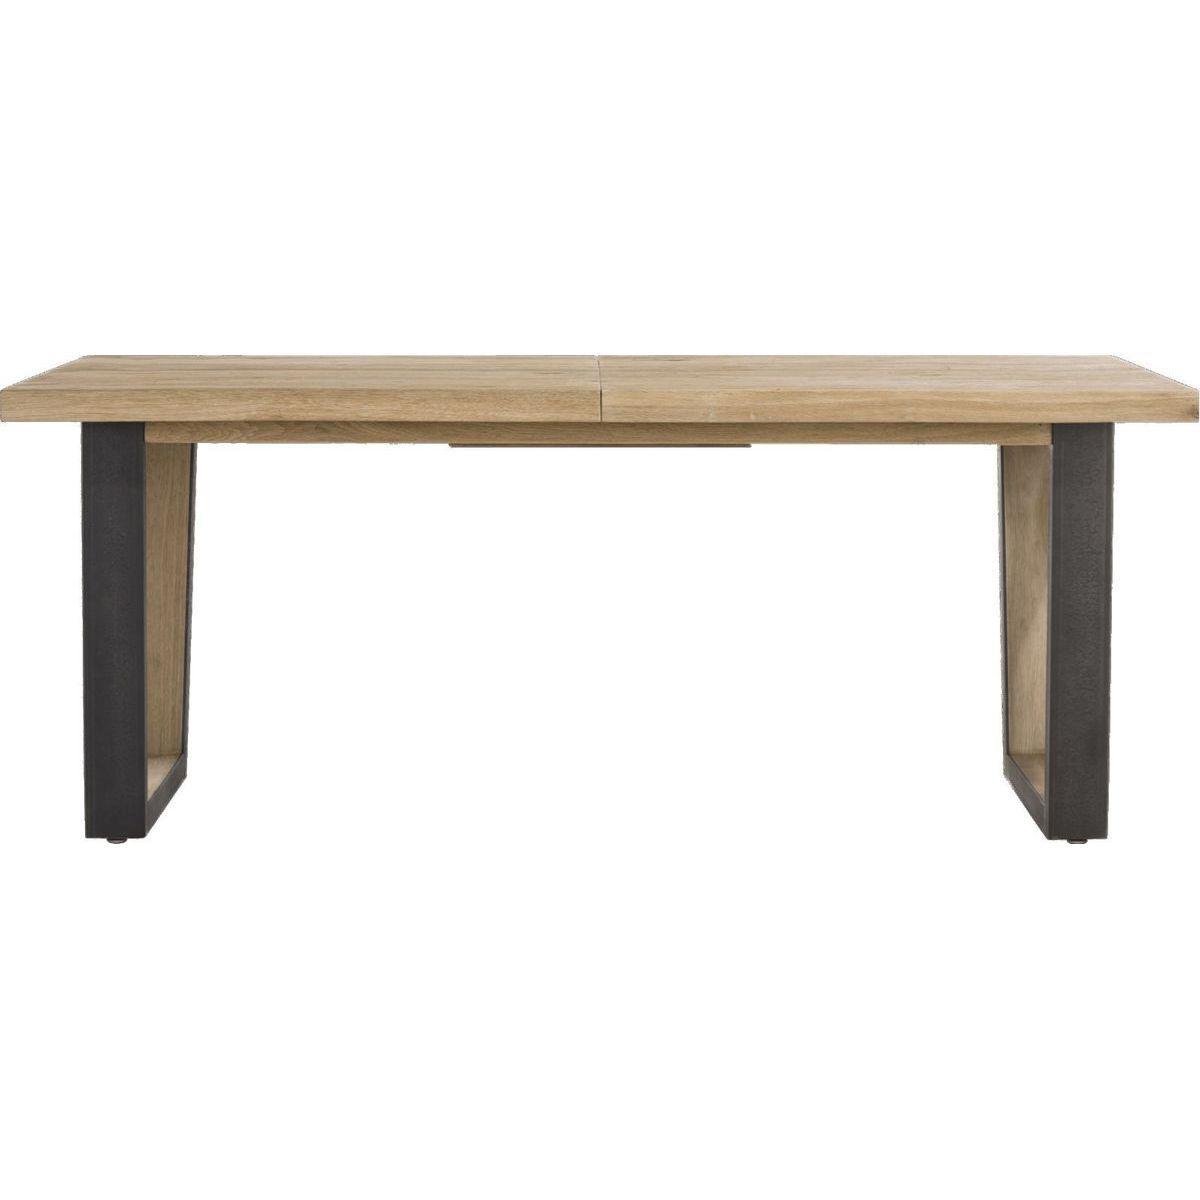 Table à rallonge METALOX by Henders & Hazel bords droits, pieds V(métal/bois) 190/240x100cm